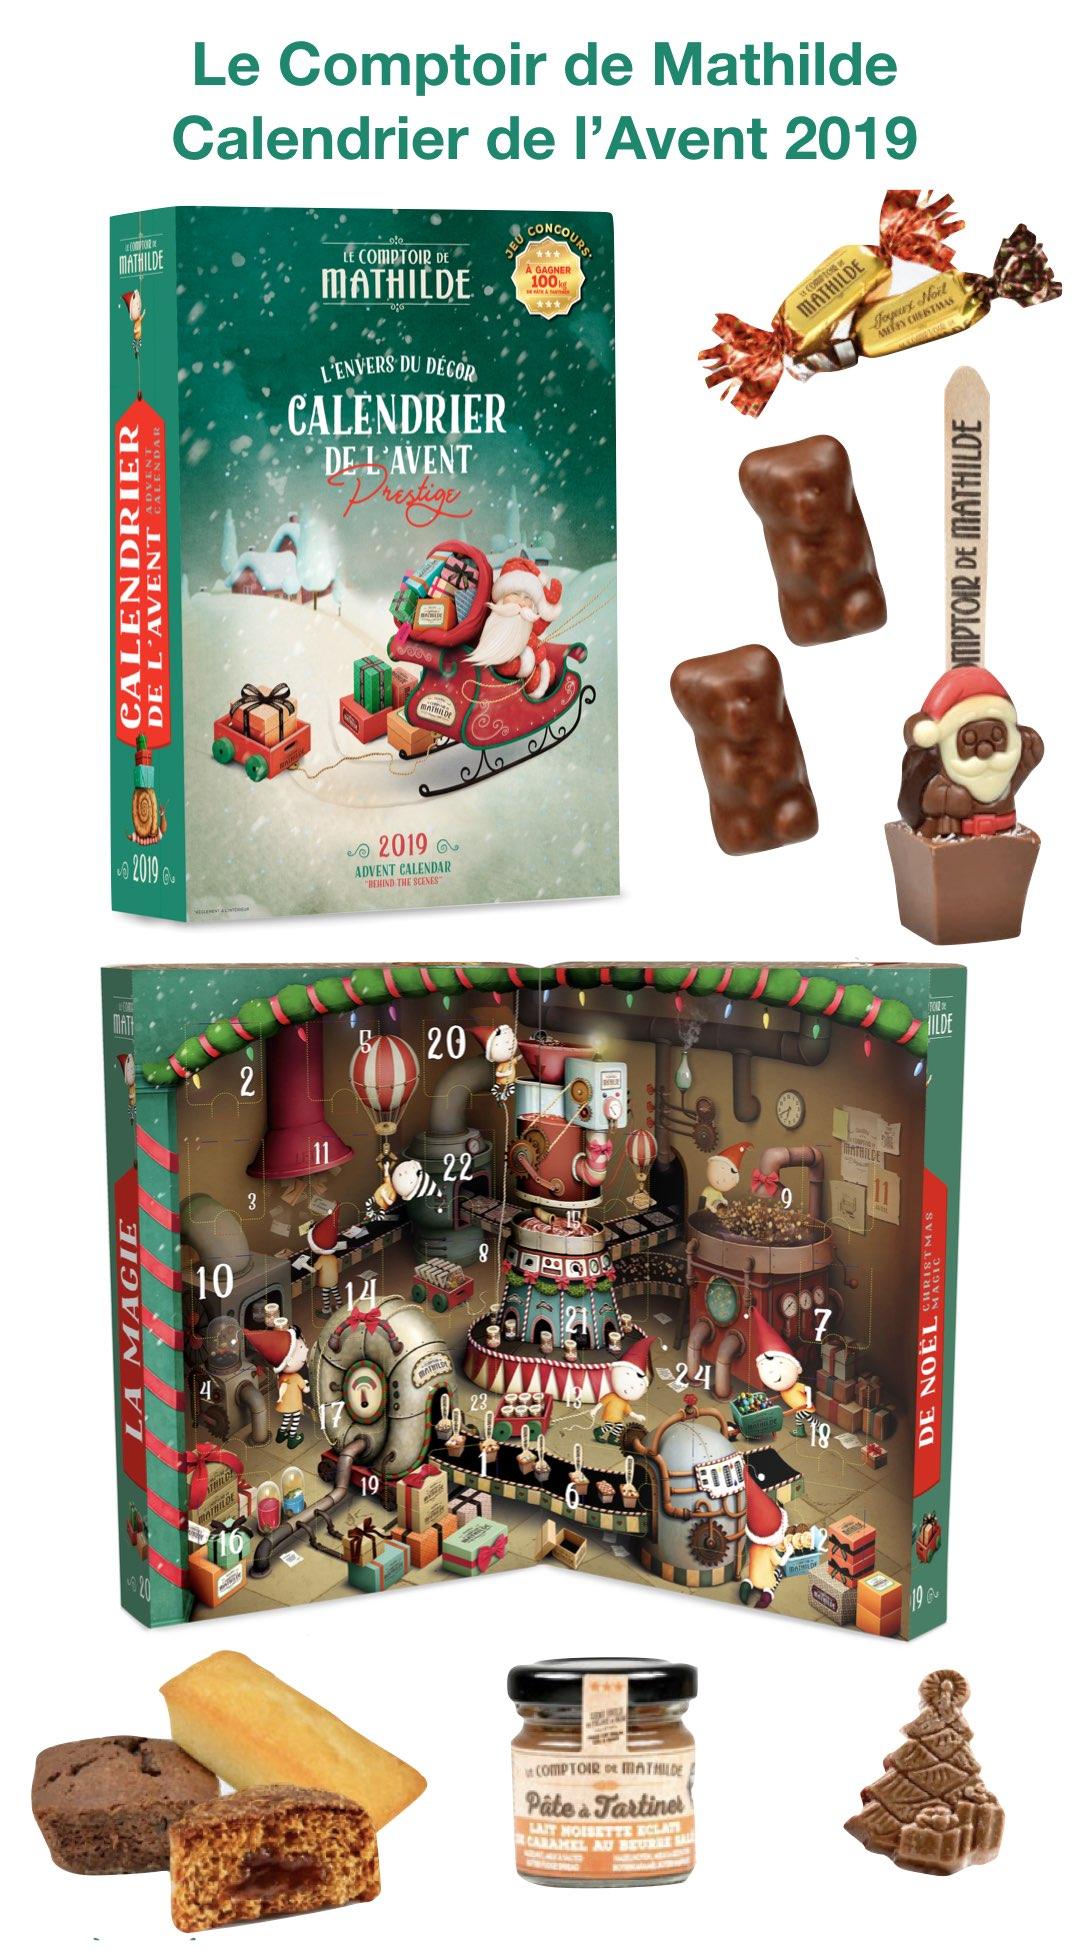 comptoir de mathilde calendrier avent 2019 gourmandise chocolat adulte cadeau ado pate a tartiner avis